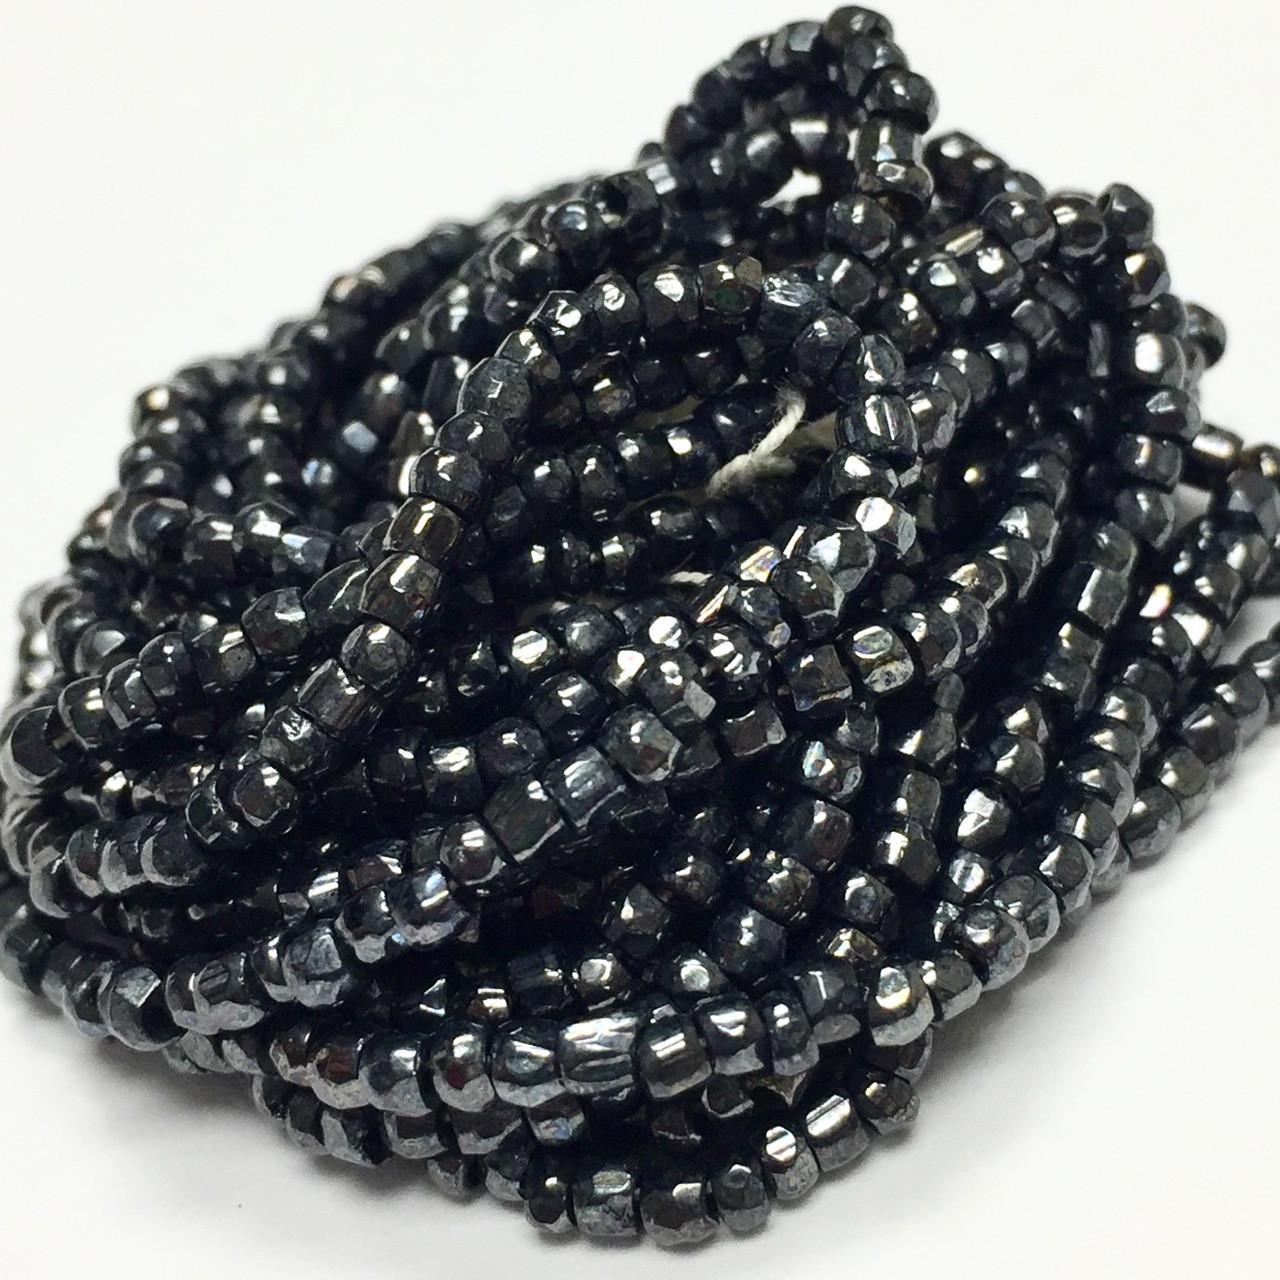 Vintage Black AB Metallic Pressed Celtic Knot Czech Glass Beads 11mm 6pcs